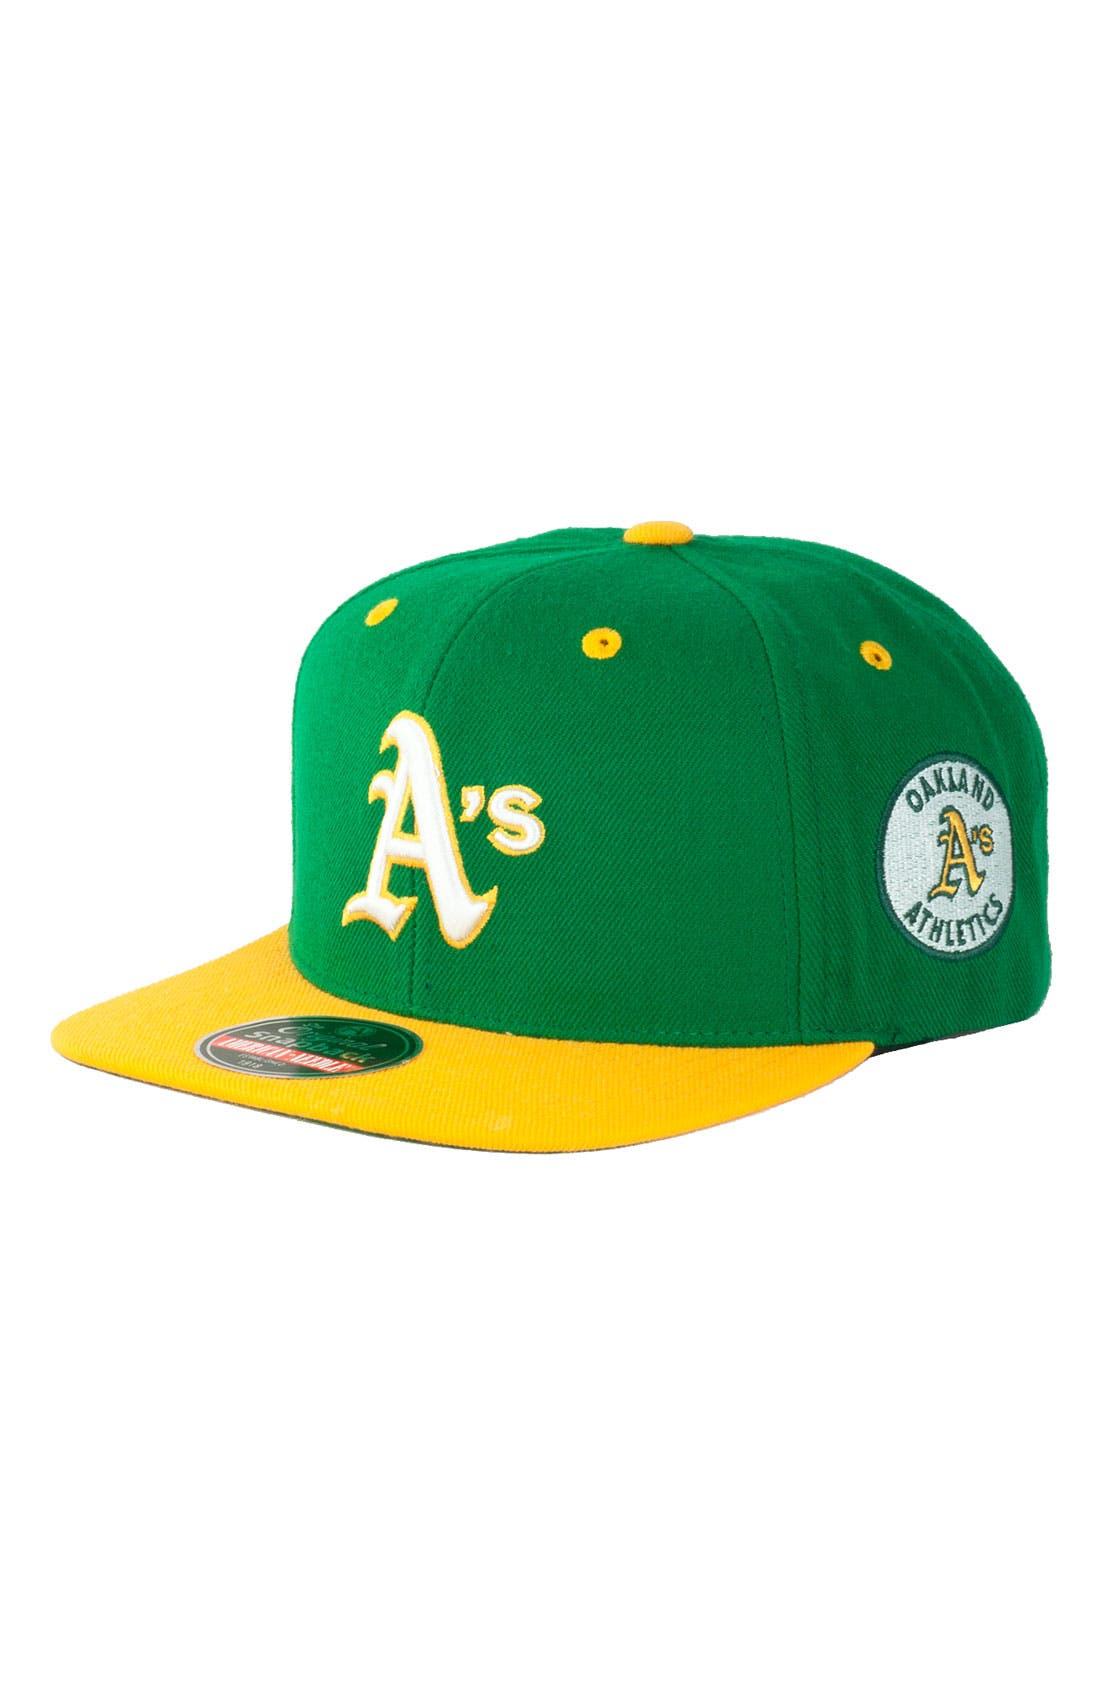 Main Image - American Needle 'Blockhead A's' Snapback Baseball Cap